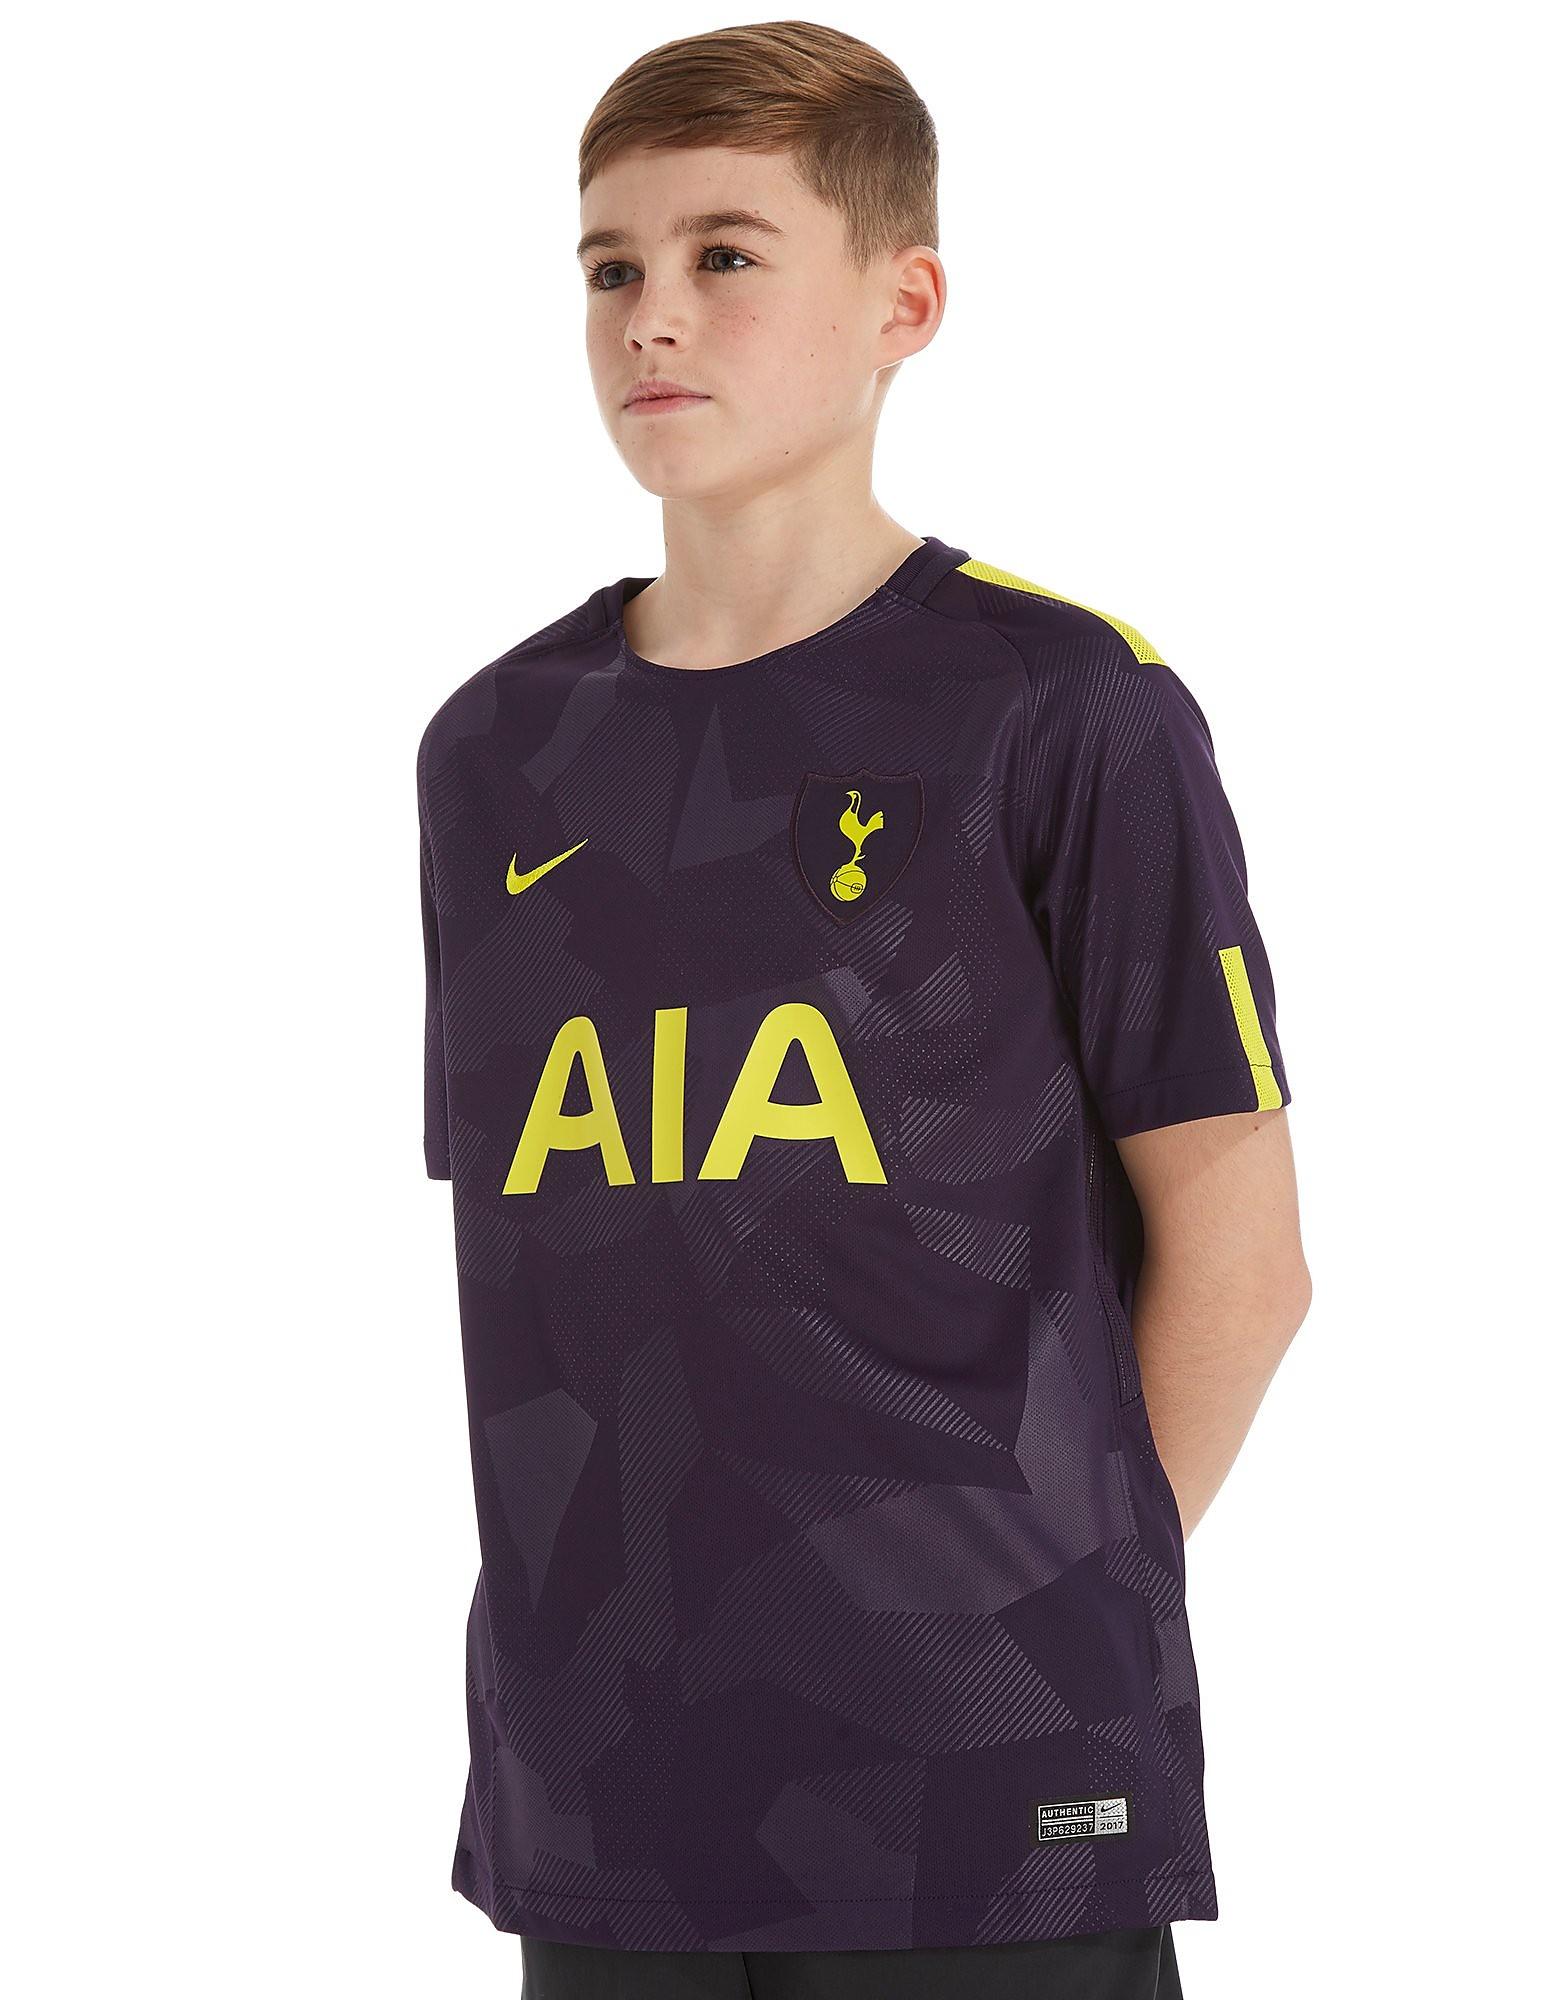 Nike Tottenham Hotspur 2017/18 Third Shirt Junior PRE